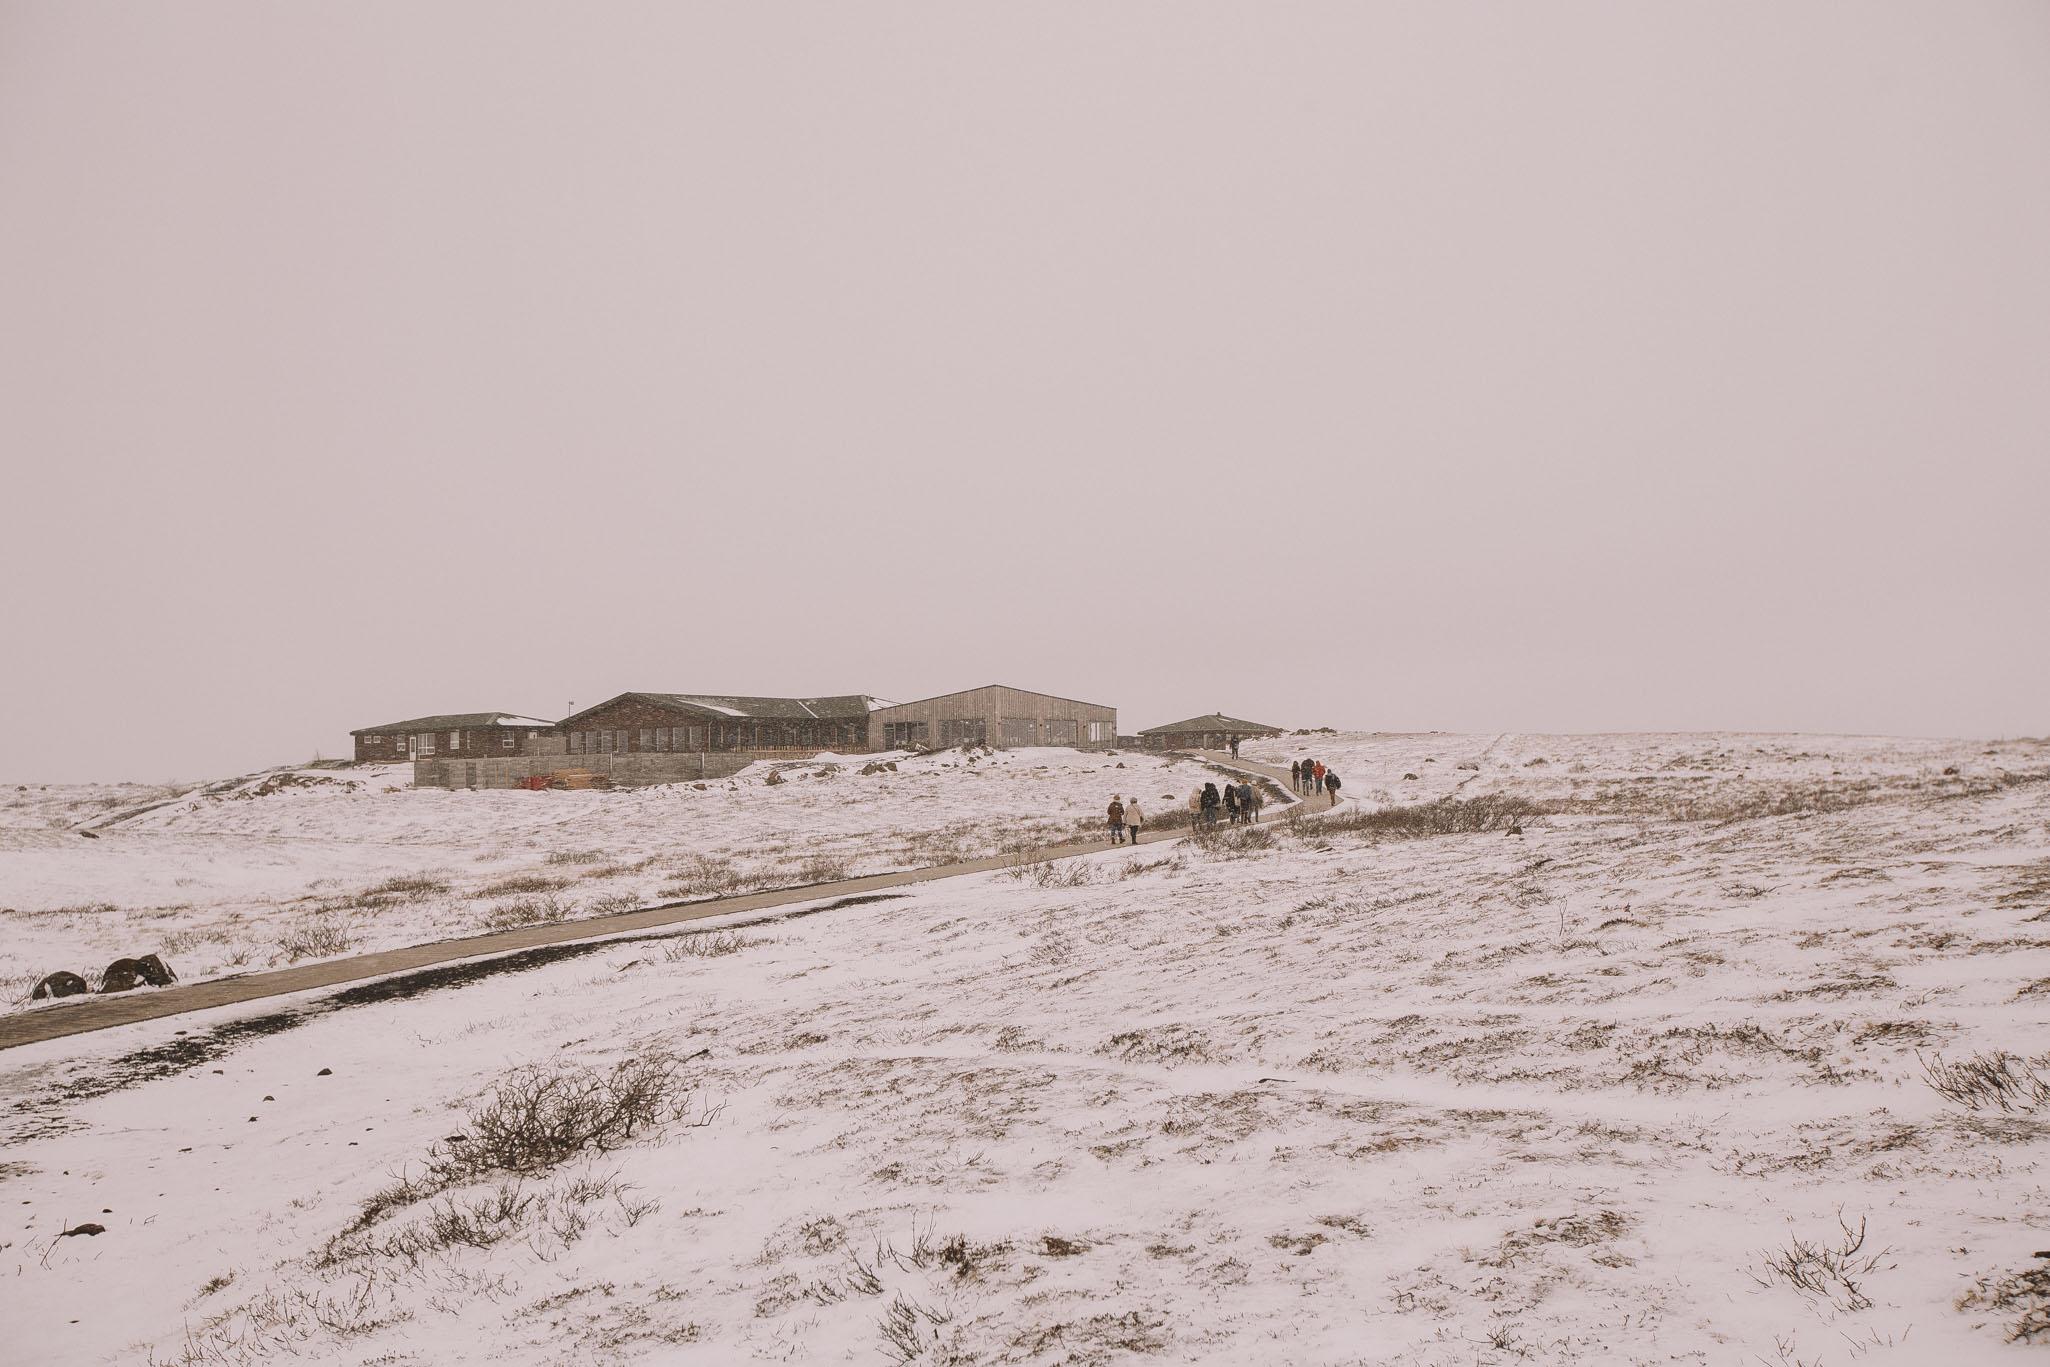 Road-trip-Islande-Iceland-Voyage-Travel-Portrait-Jérémy-Boyer-Geysir-Geysers-Horse-snow-ice-Gullfoss-9.jpg